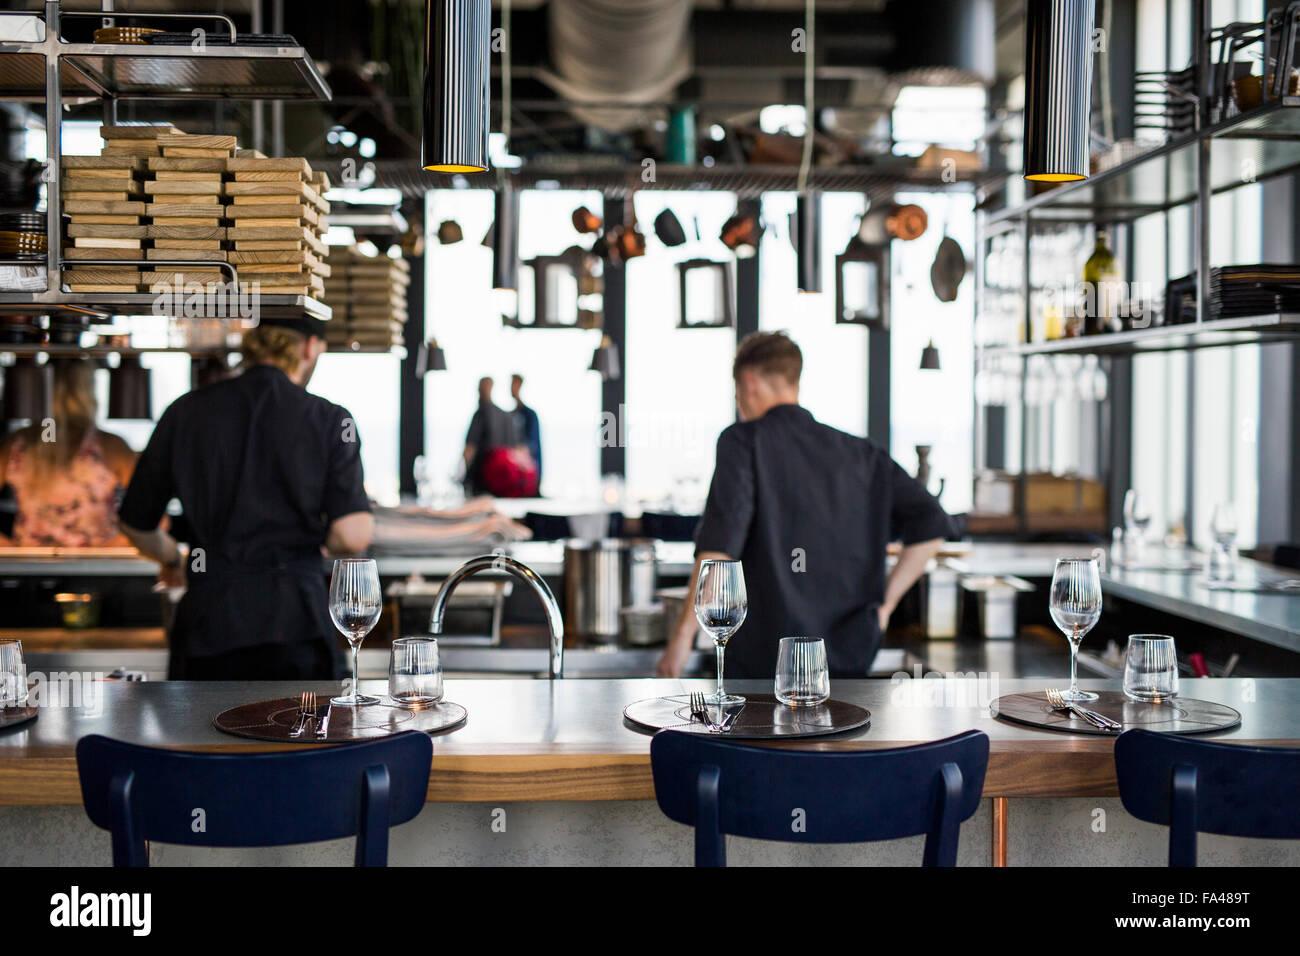 Restaurant Kitchen View rear view of chefs cooking food in kitchen at skybar restaurant